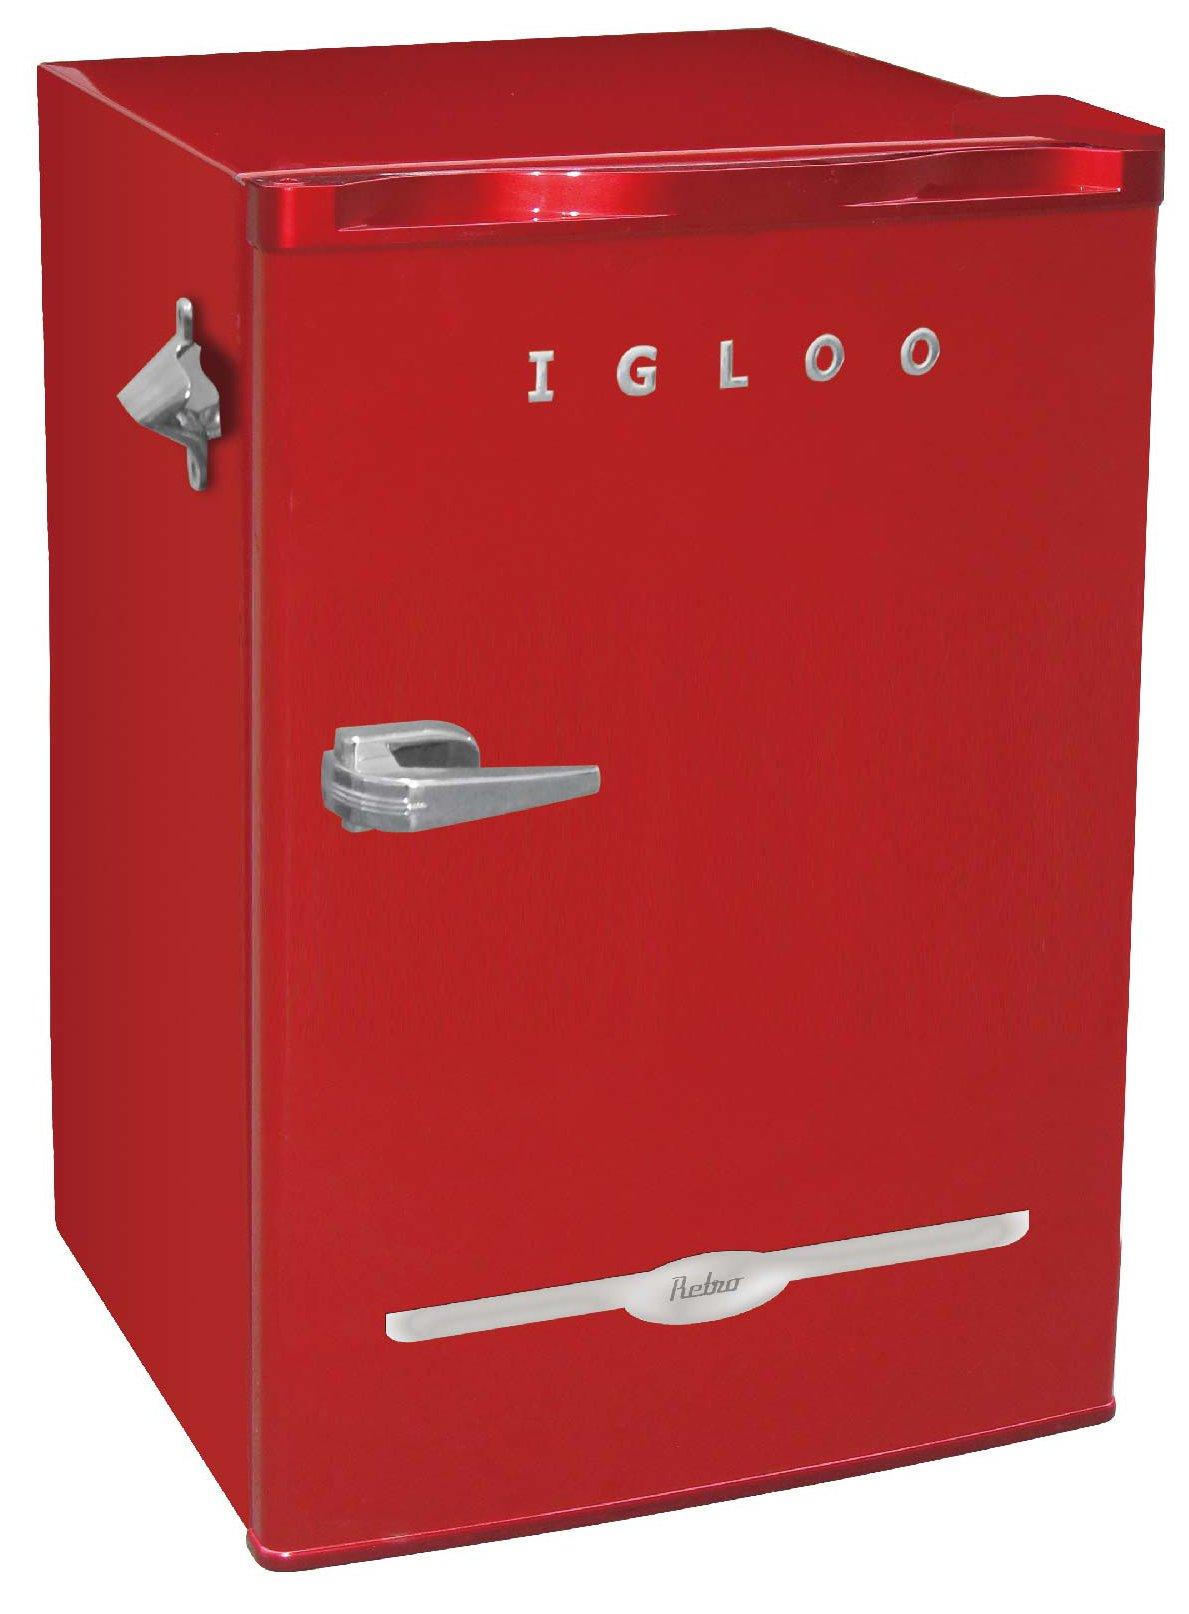 Igloo FR376-RED Retro Bar Fridge with Side Bottle Opener, 3.2 cu. ft., Red